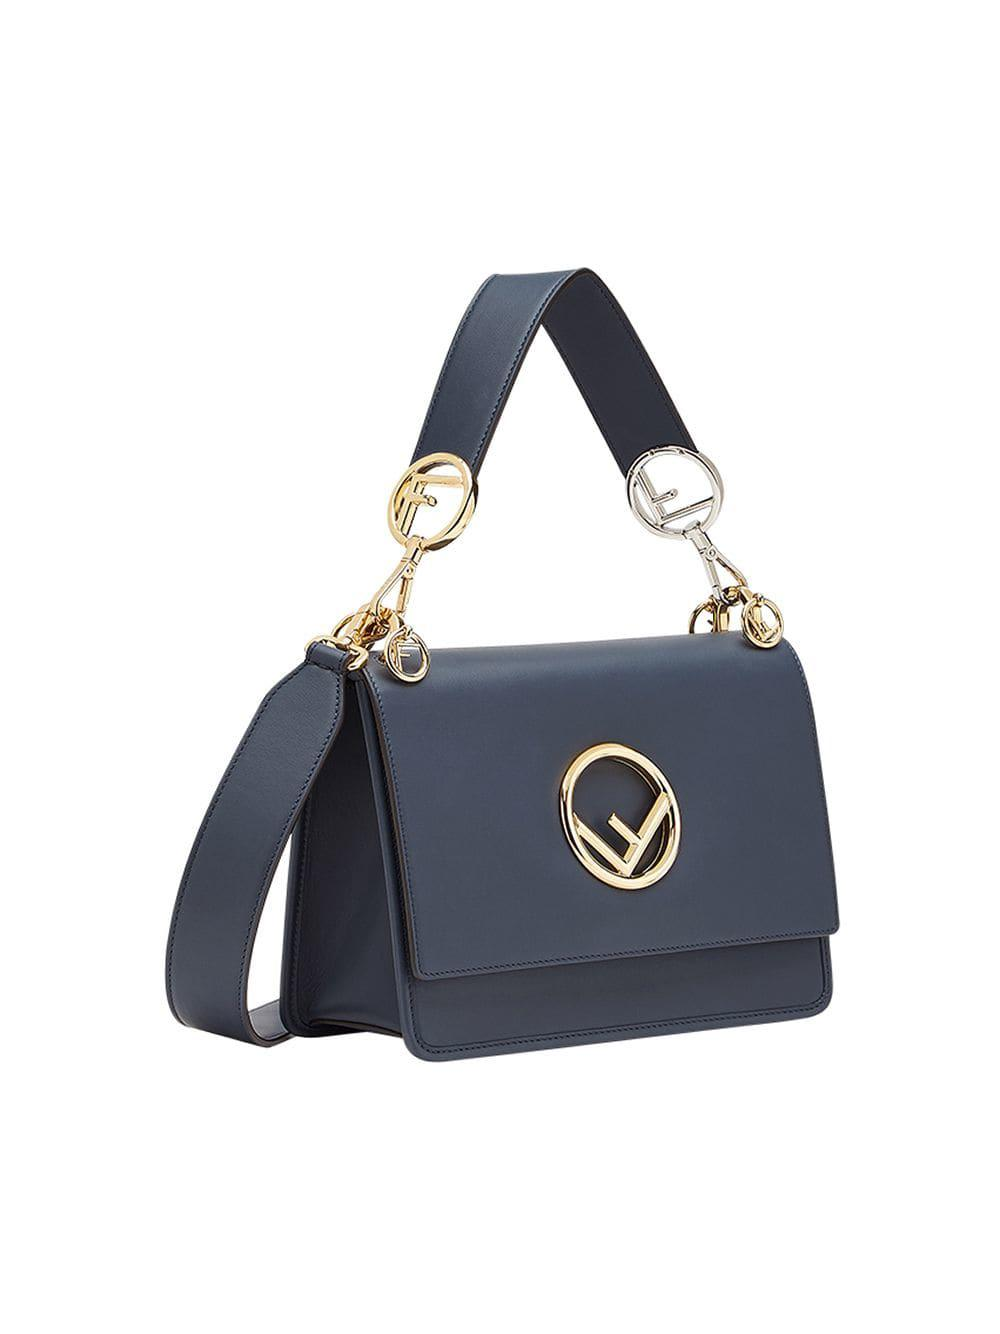 fdbf4dce62e1 Lyst - Fendi Kan I F Shoulder Bag in Blue